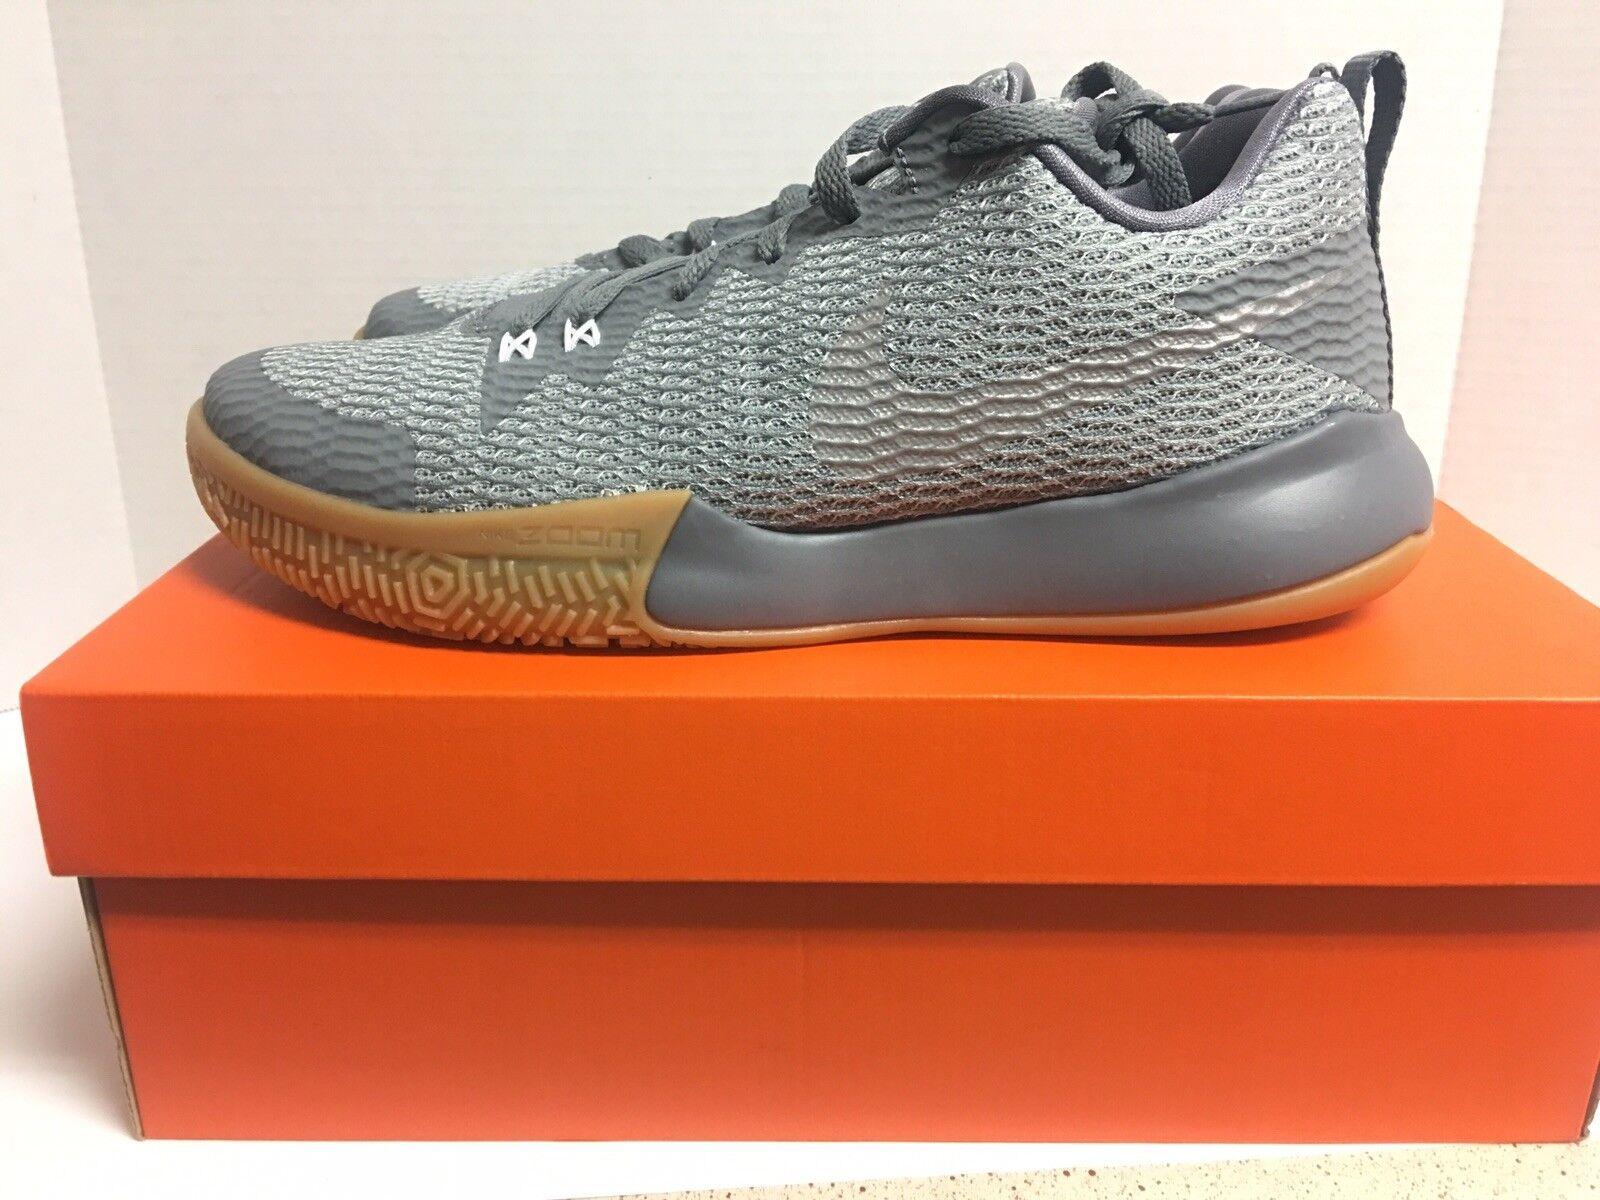 Nike Zoom Live II Cool Grey   Gum Mens Basketball shoes Ah7566-002 Size 10